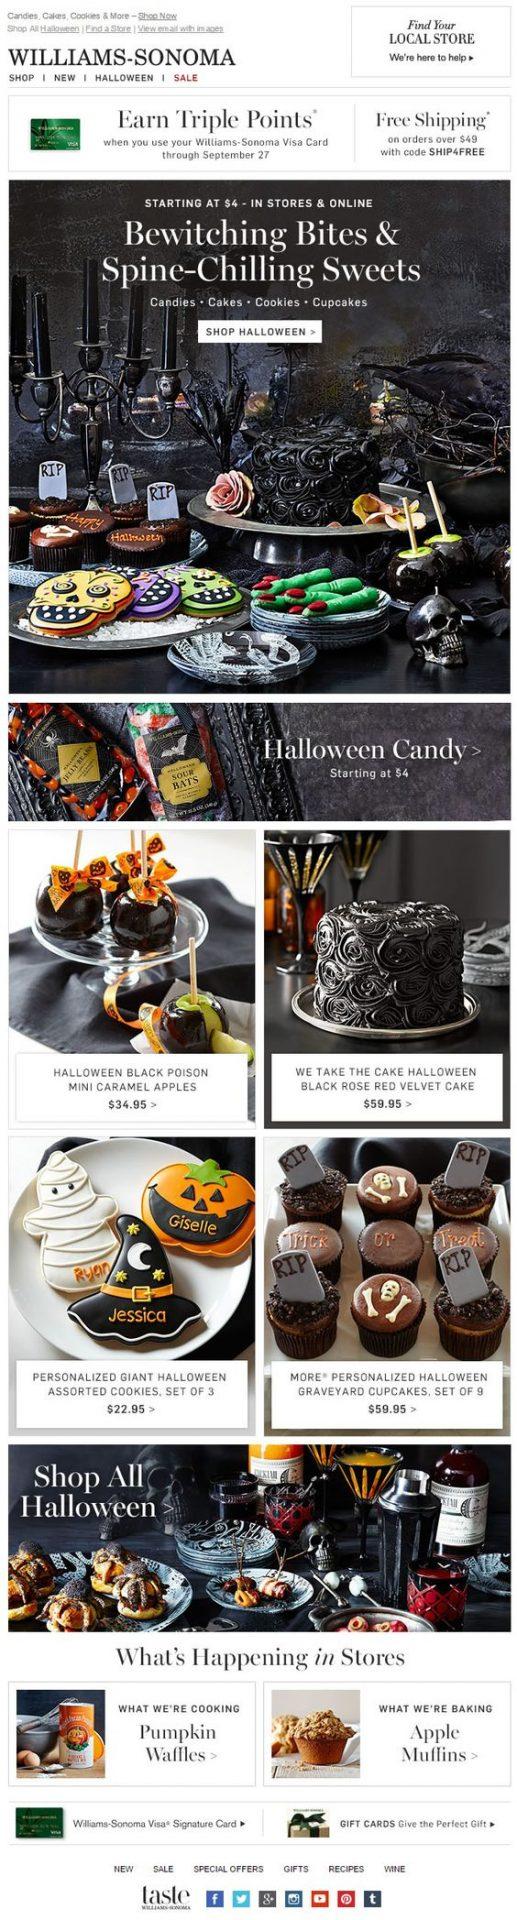 williams sonoma halloween party treat ideas